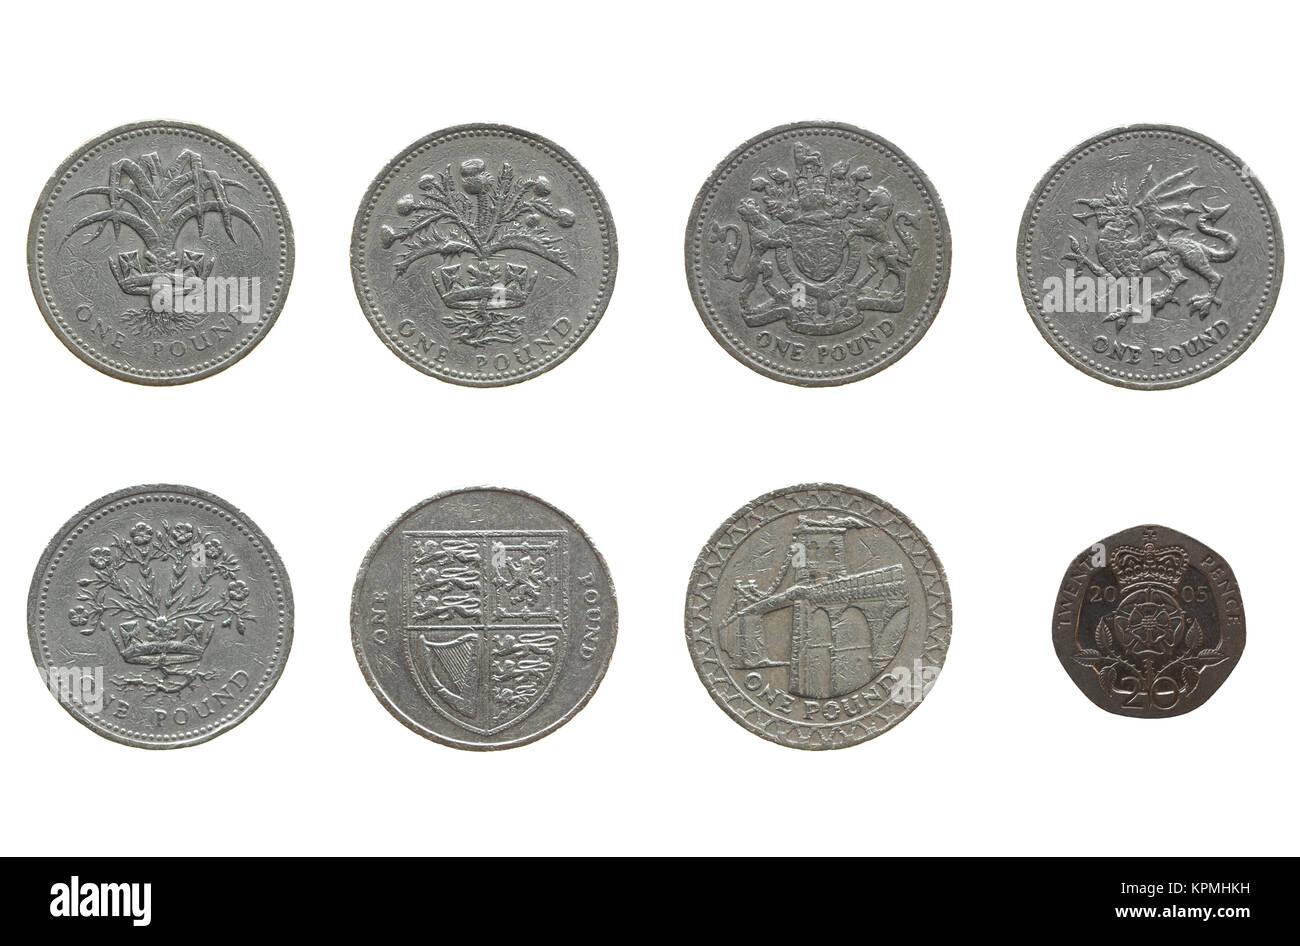 New UK national living wage 7.20 GBP - Stock Image